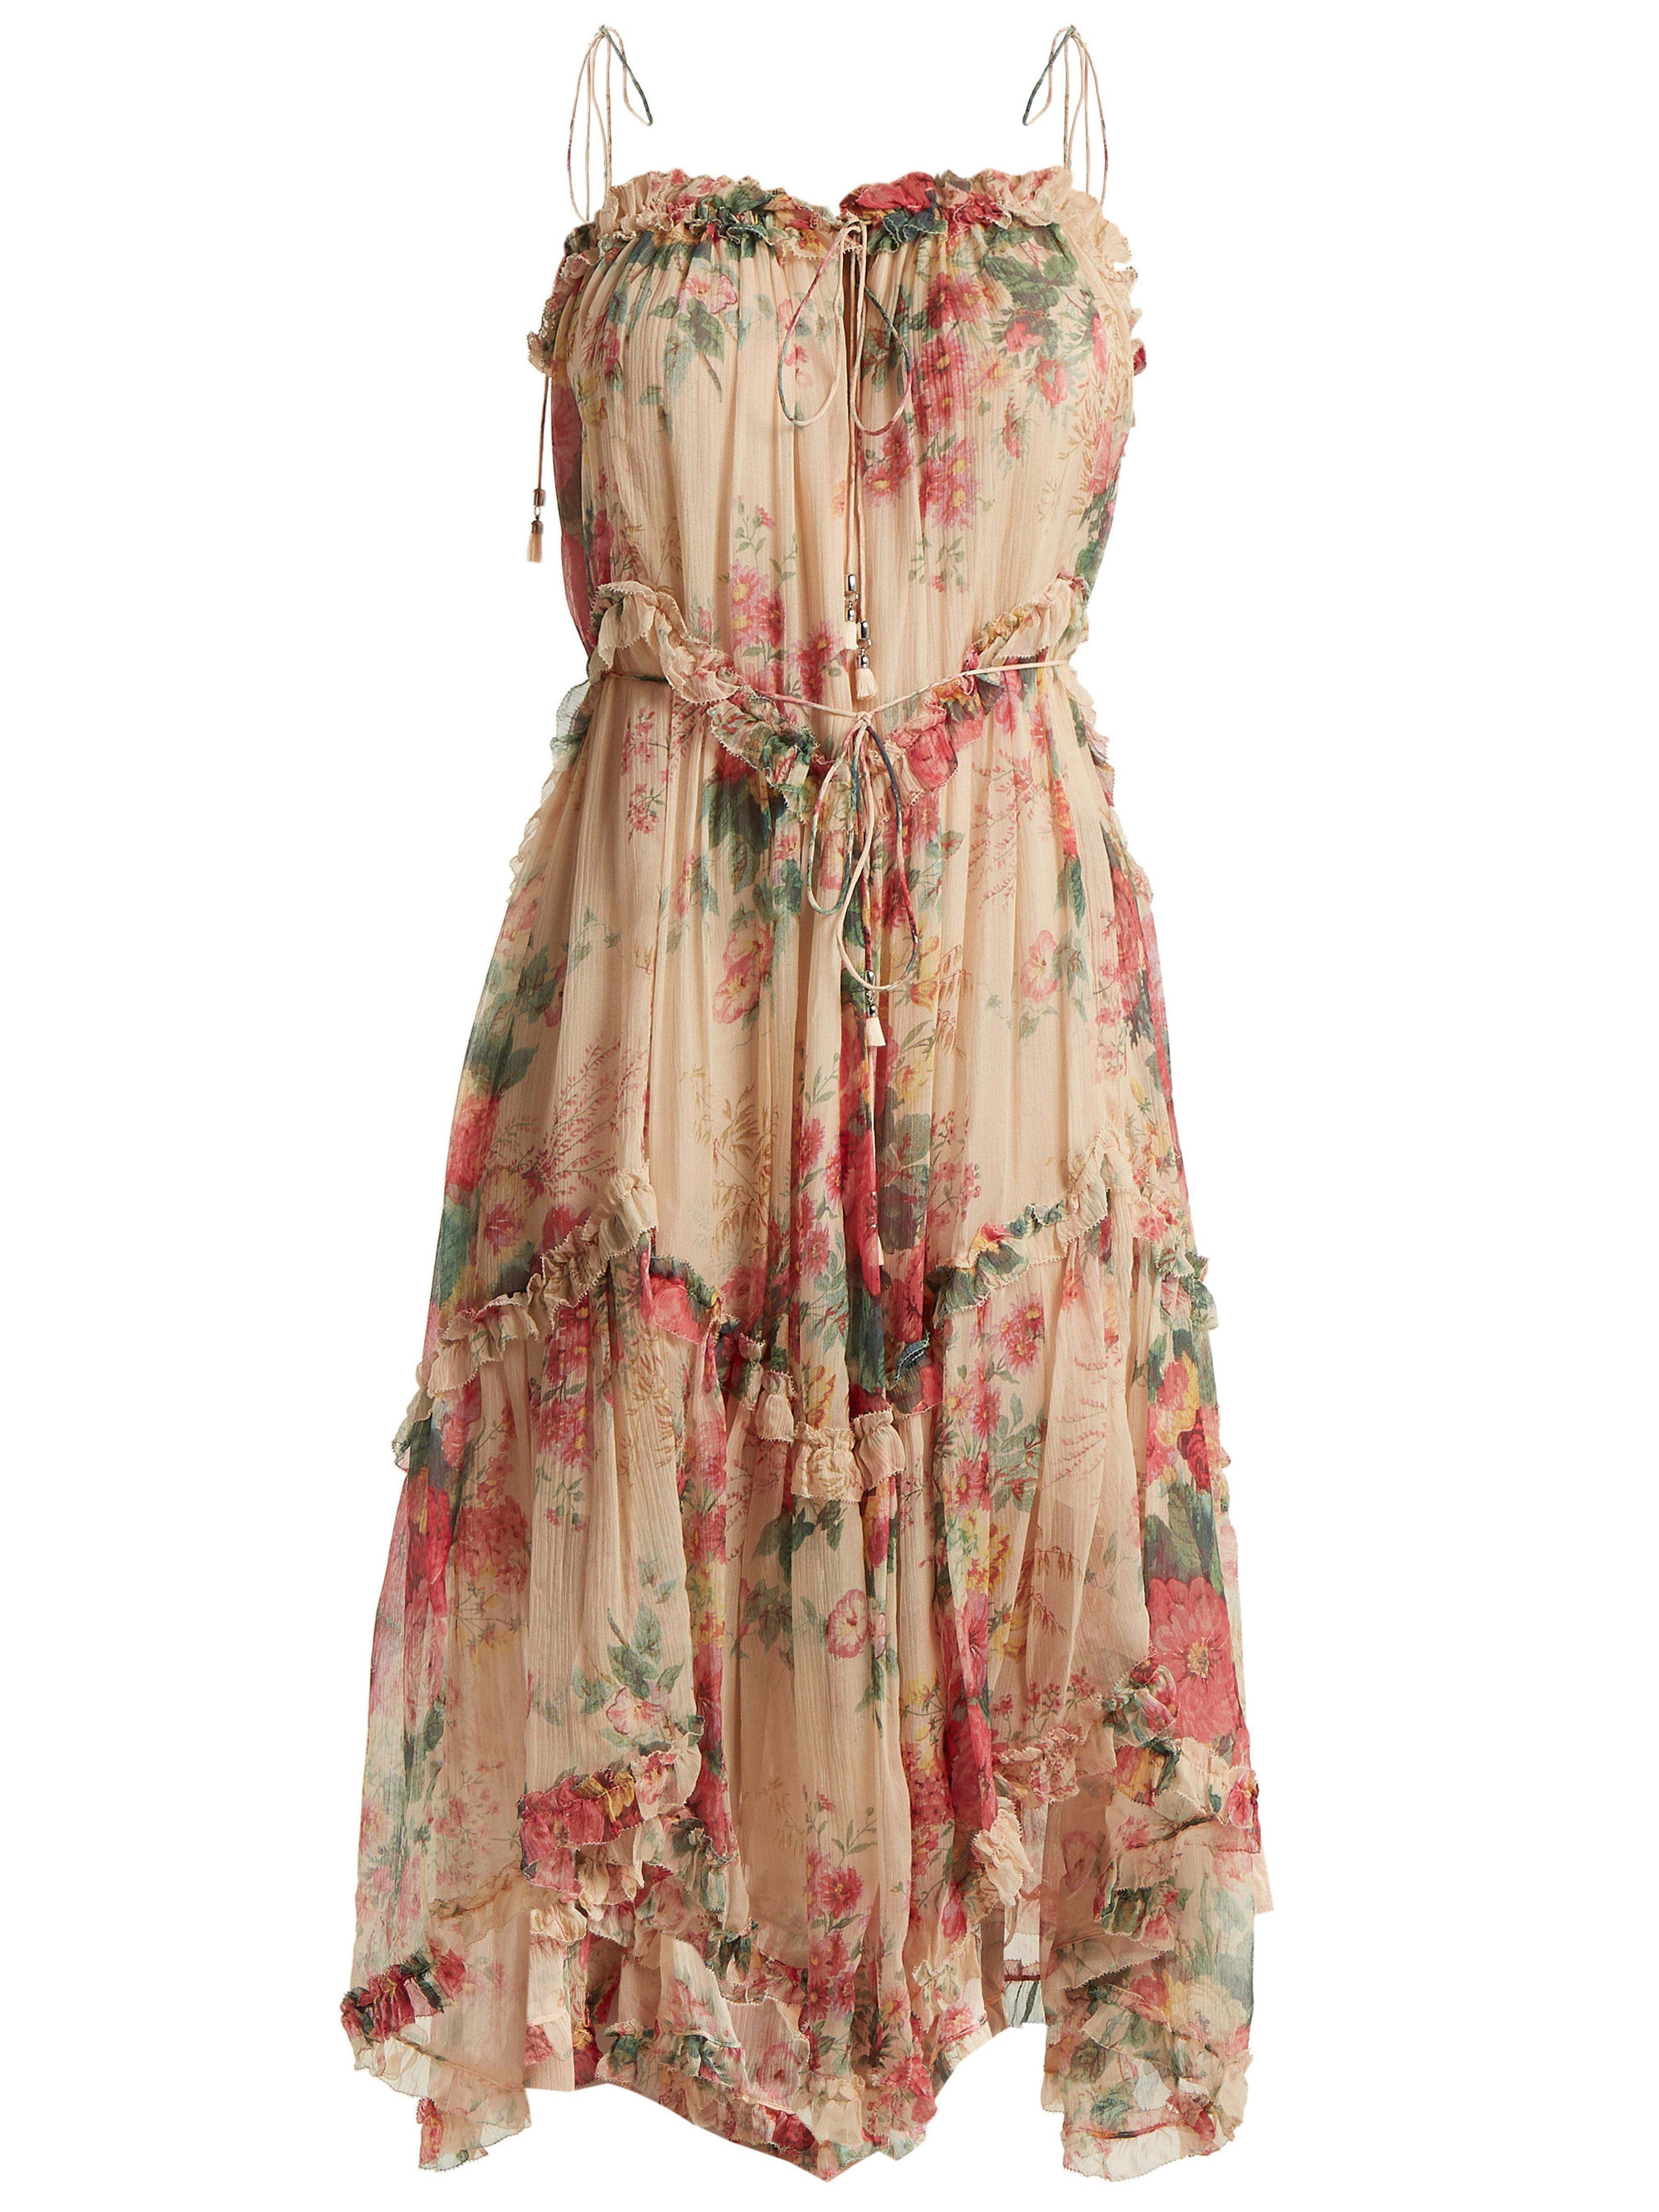 6f75358d18 Zimmermann Laelia Floral Print Silk Dress - Save 17% - Lyst